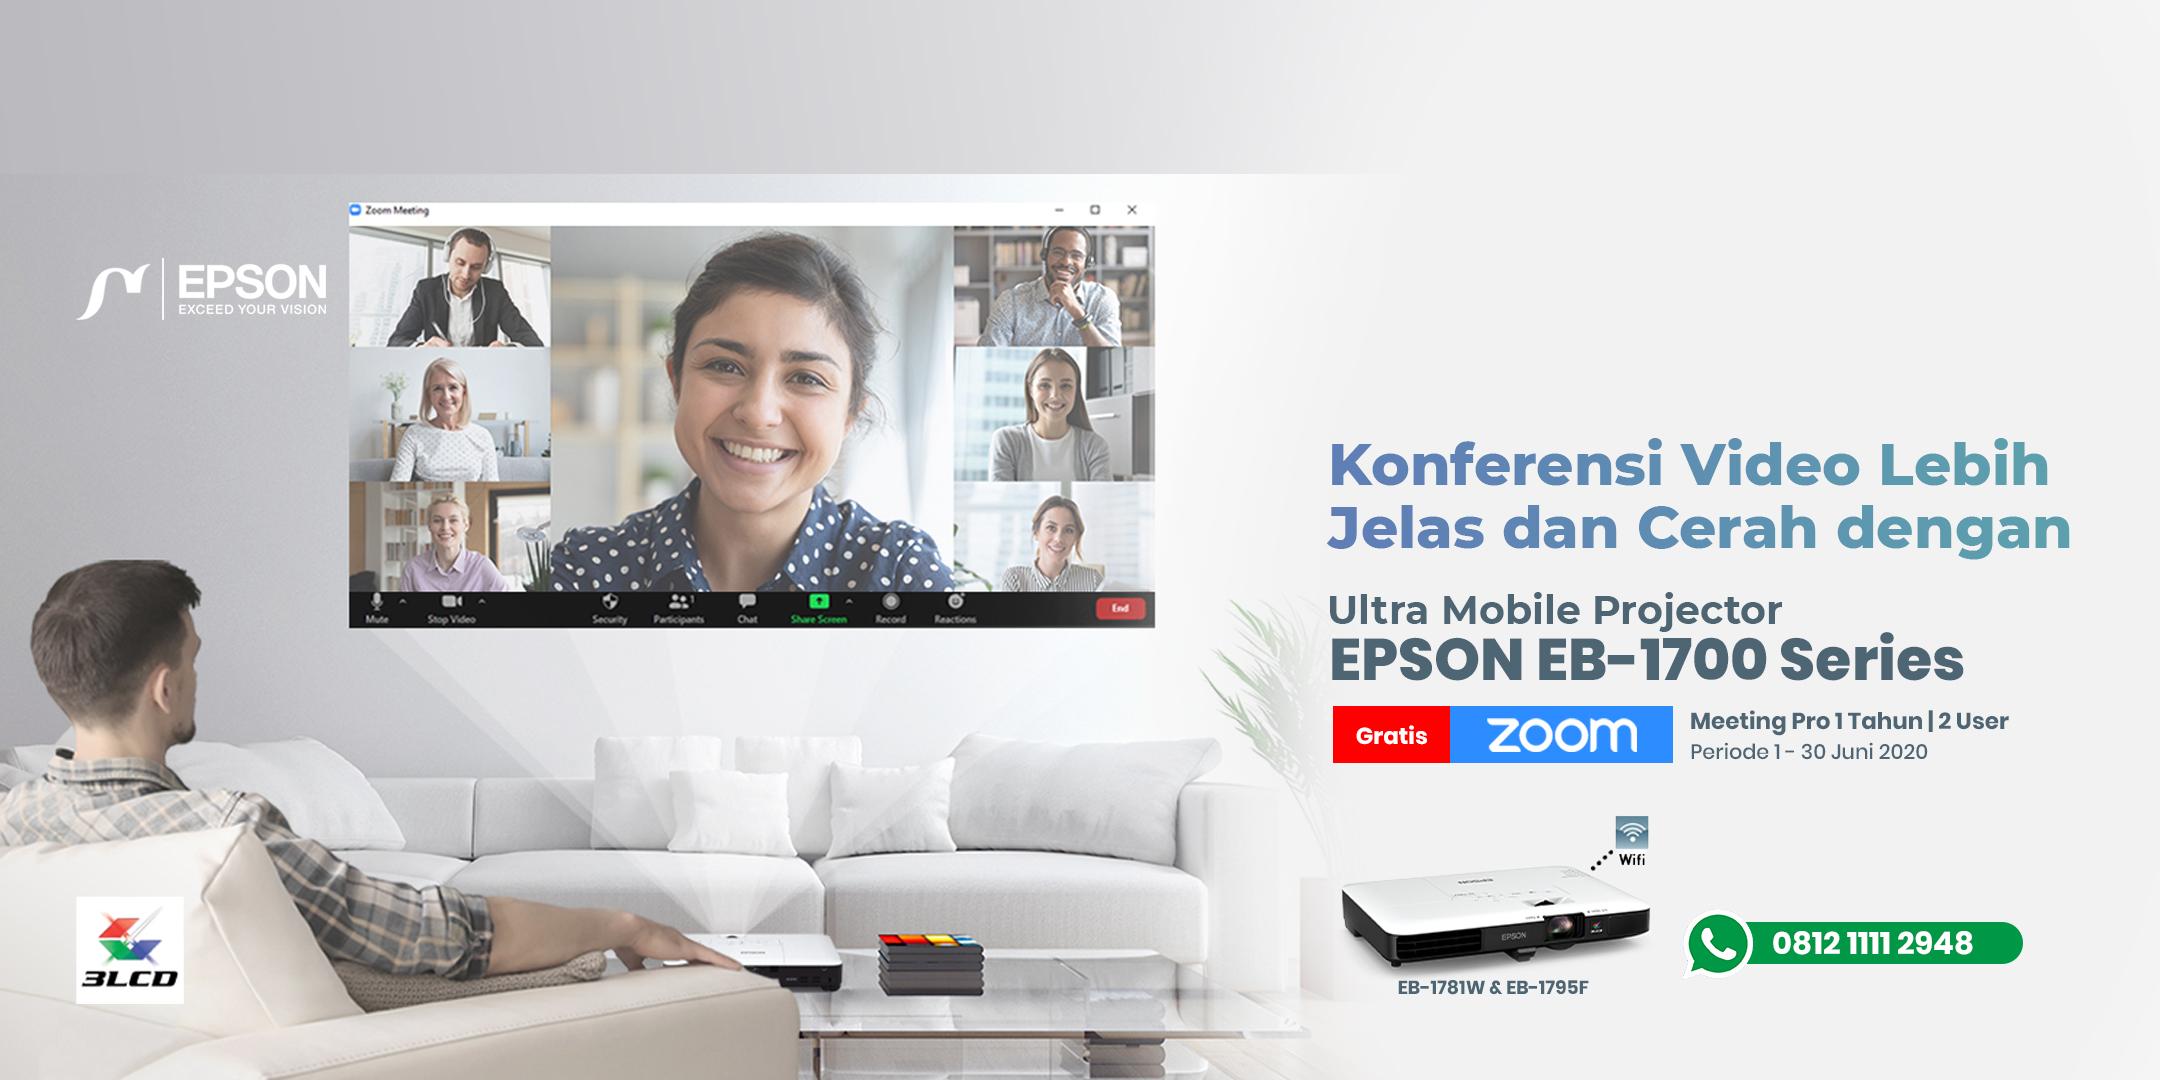 Promo Epson EB-1700 Series gratis Zoom